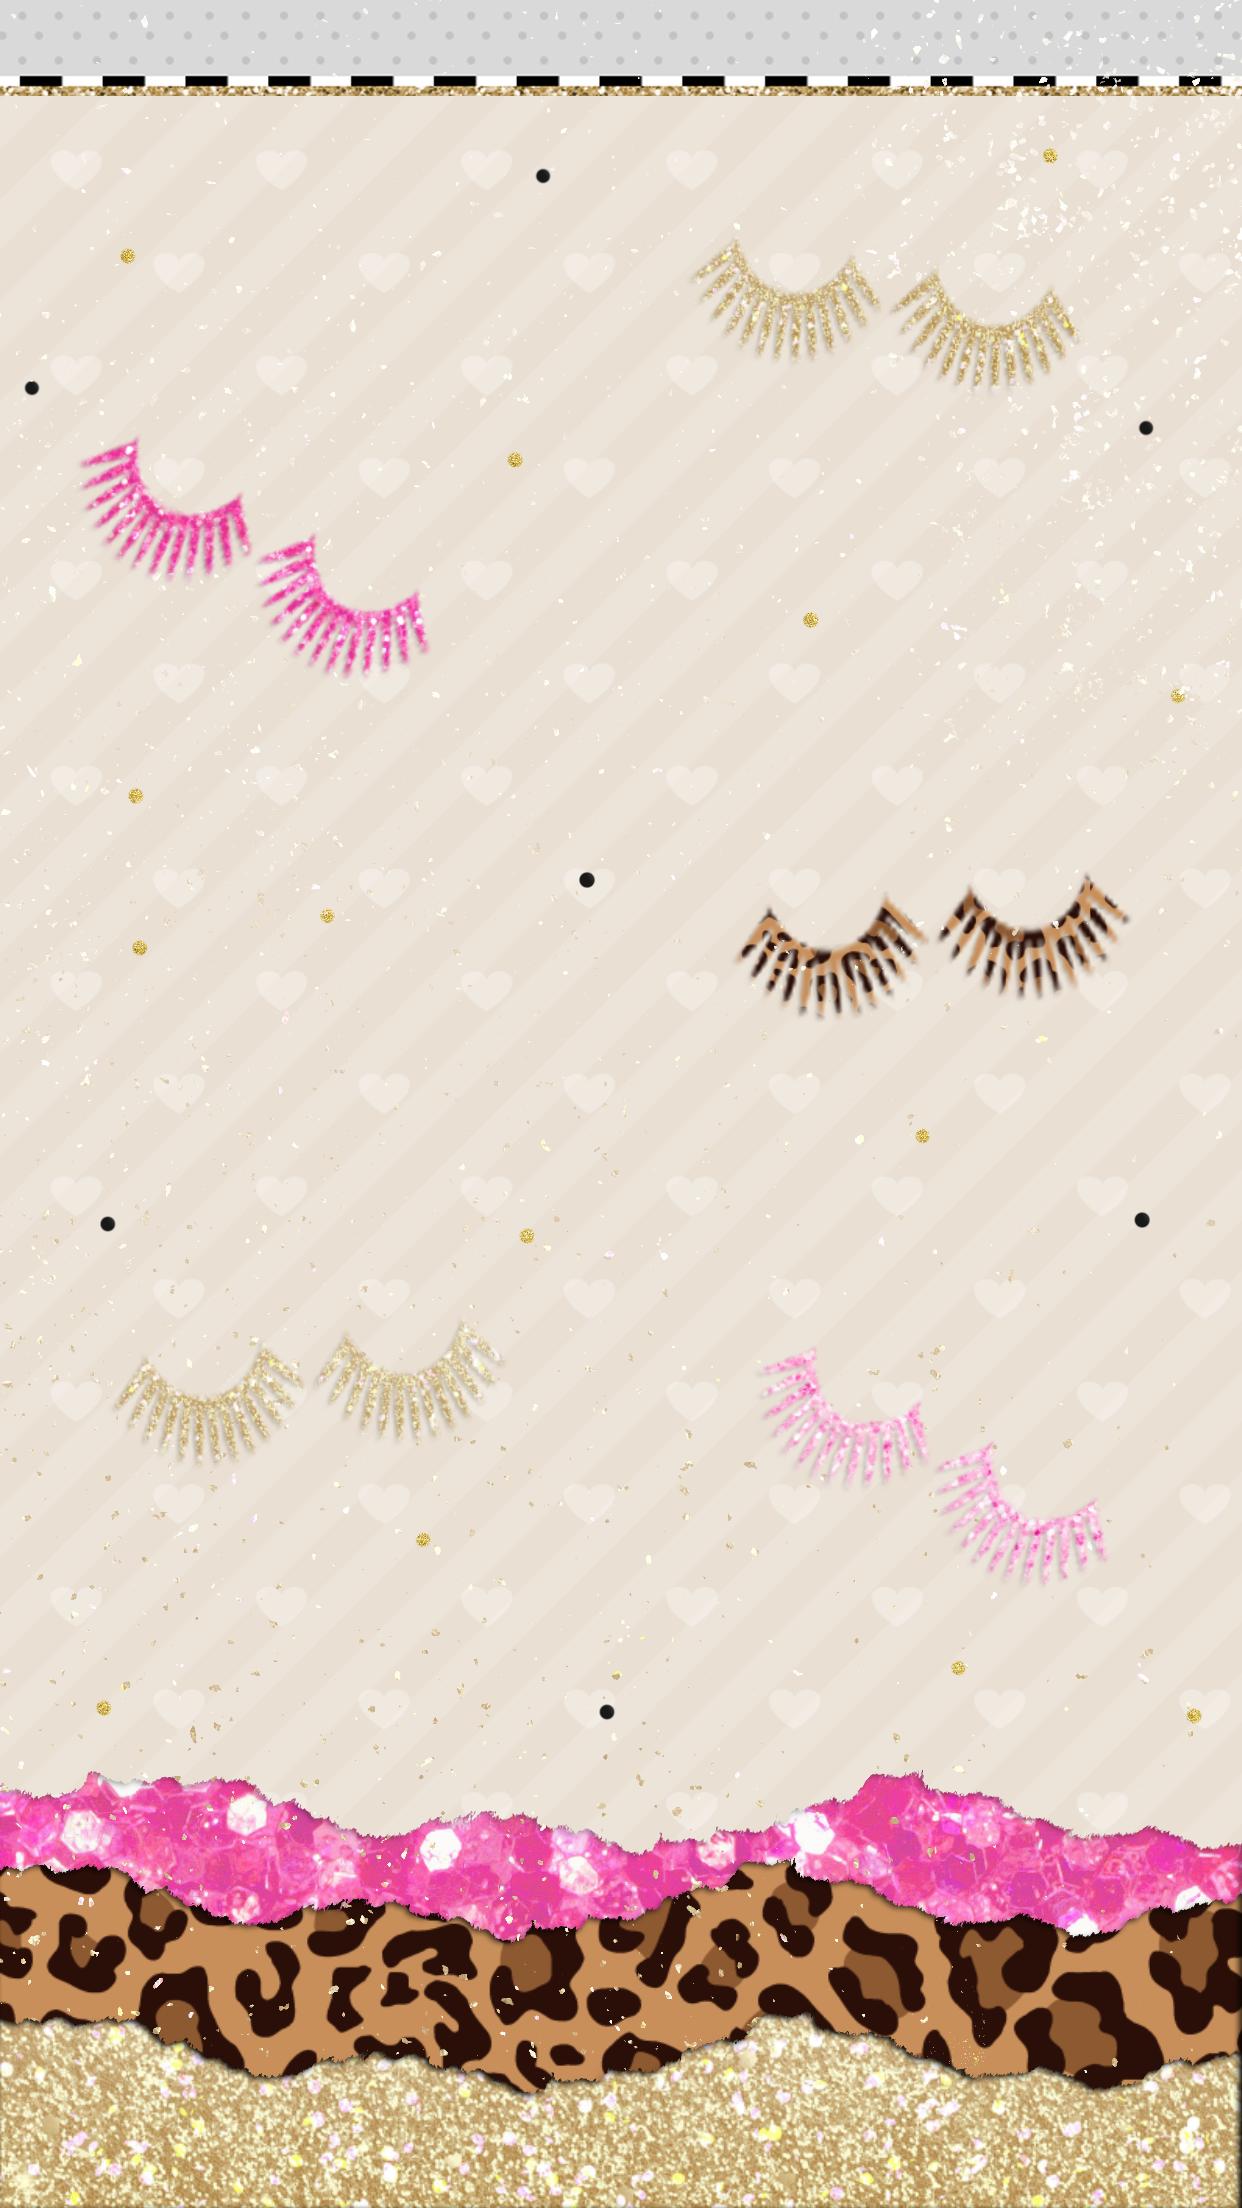 Pink Wallpapero Kitty Wallpaper Wallpaper Backgrounds Cute Wallpapers Desktop Wallpapers Designer Wallpaper Style Iphone 3 Salon Ideas